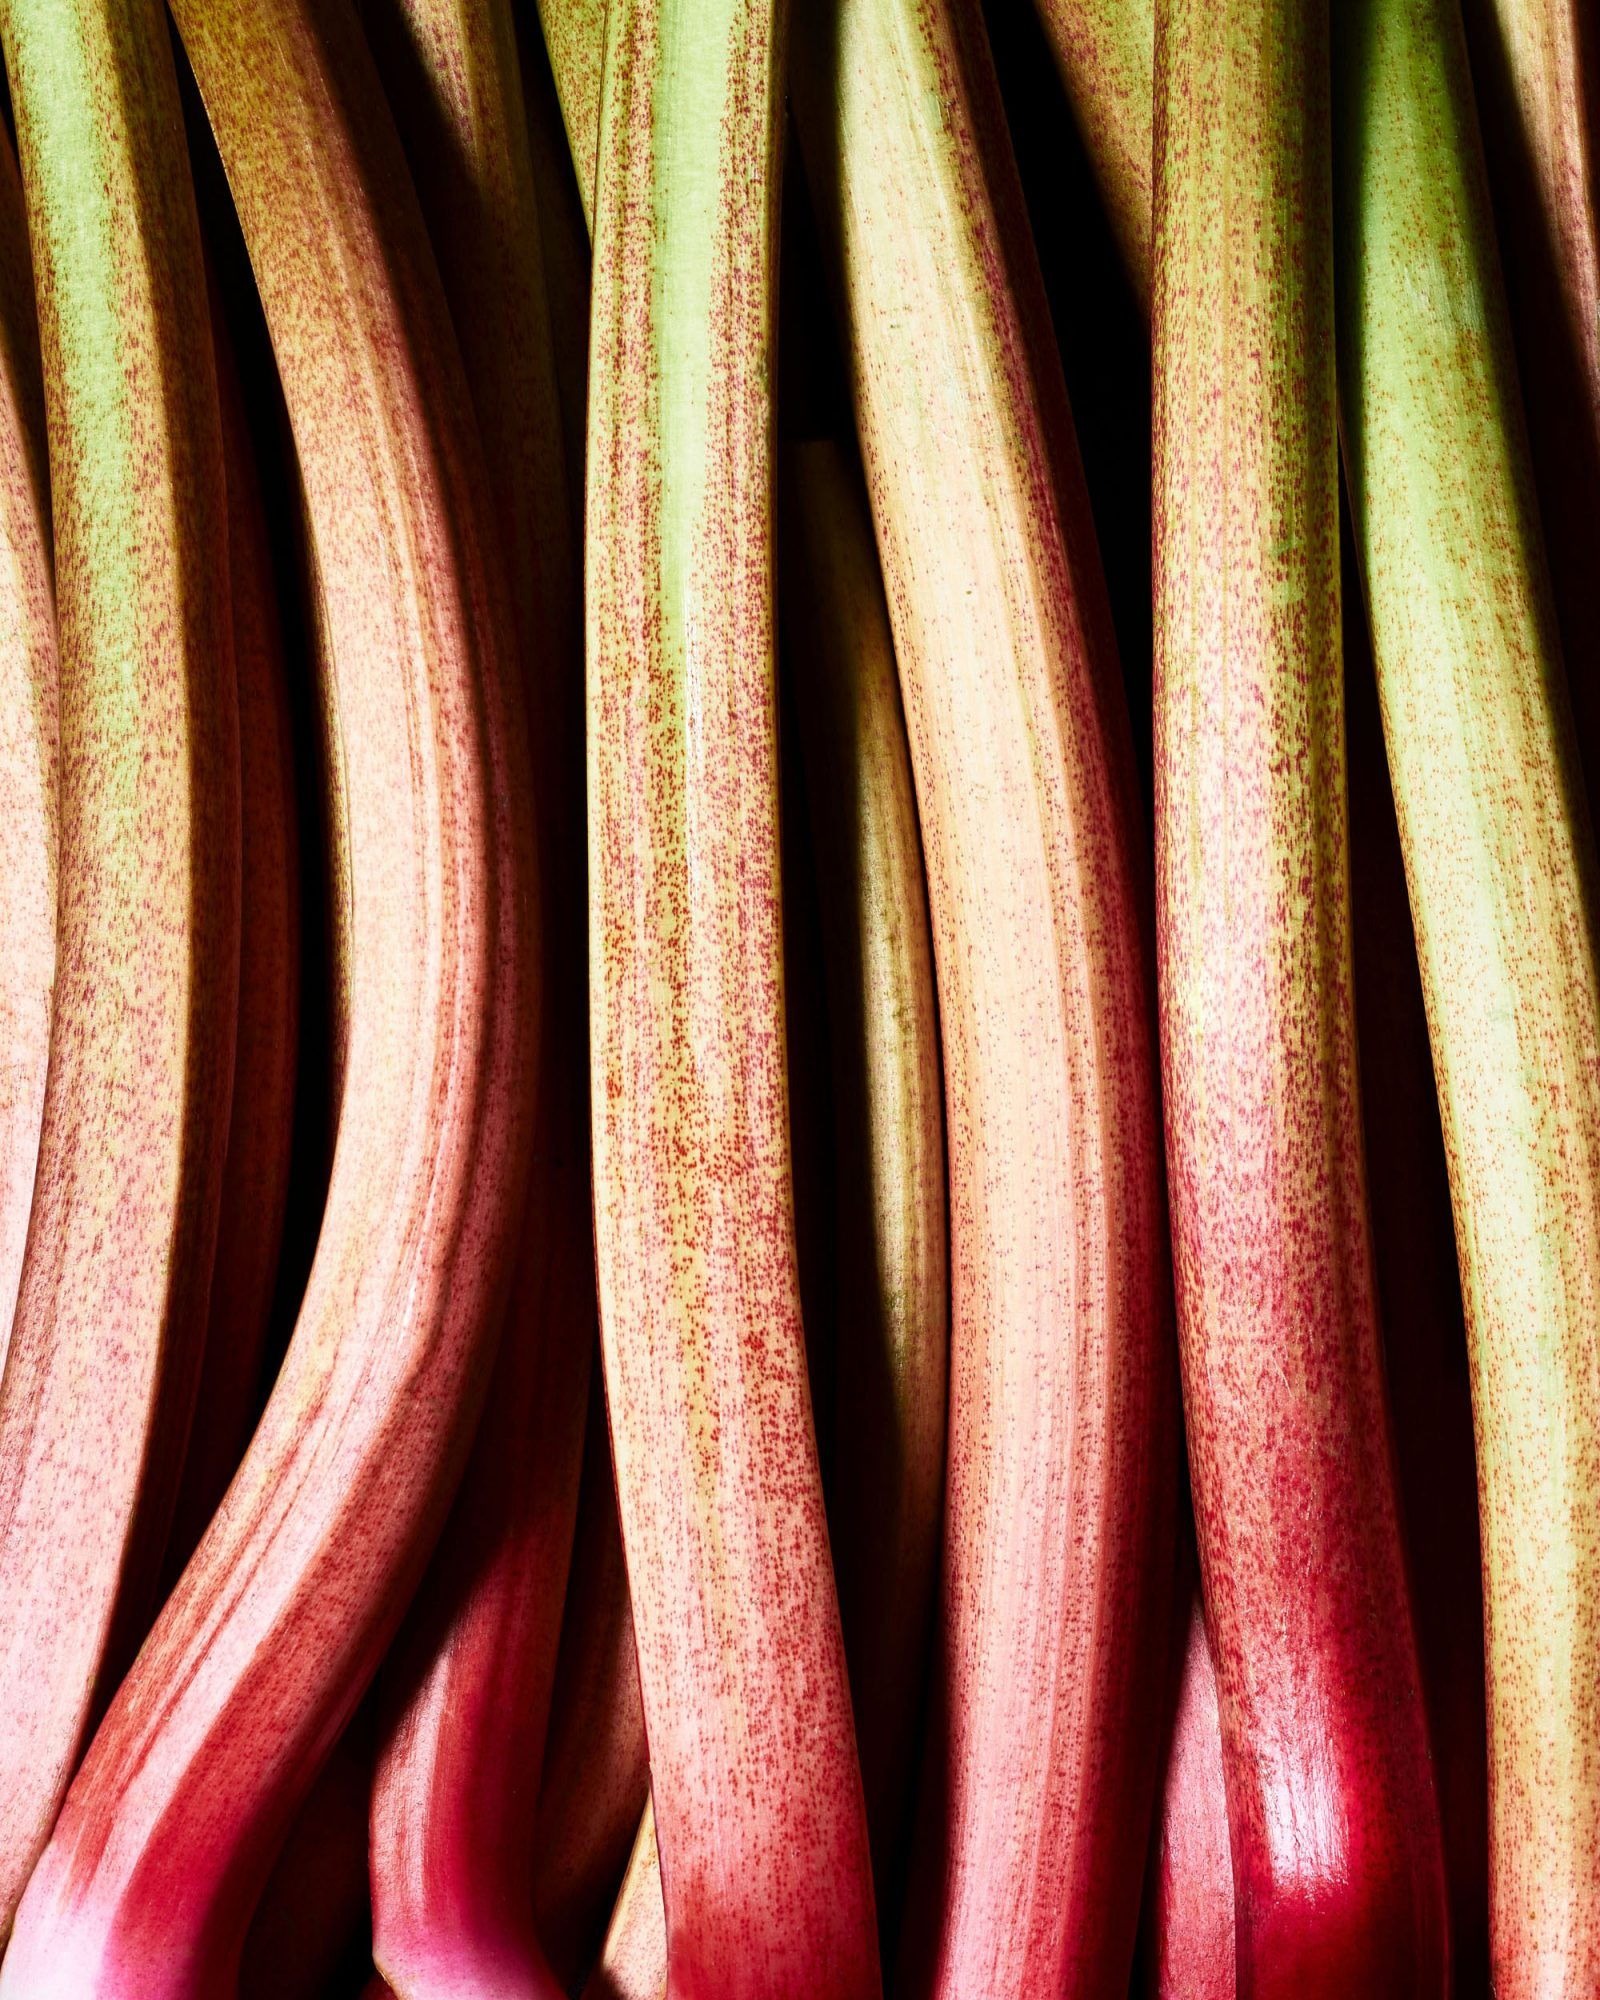 rhubarb sticks